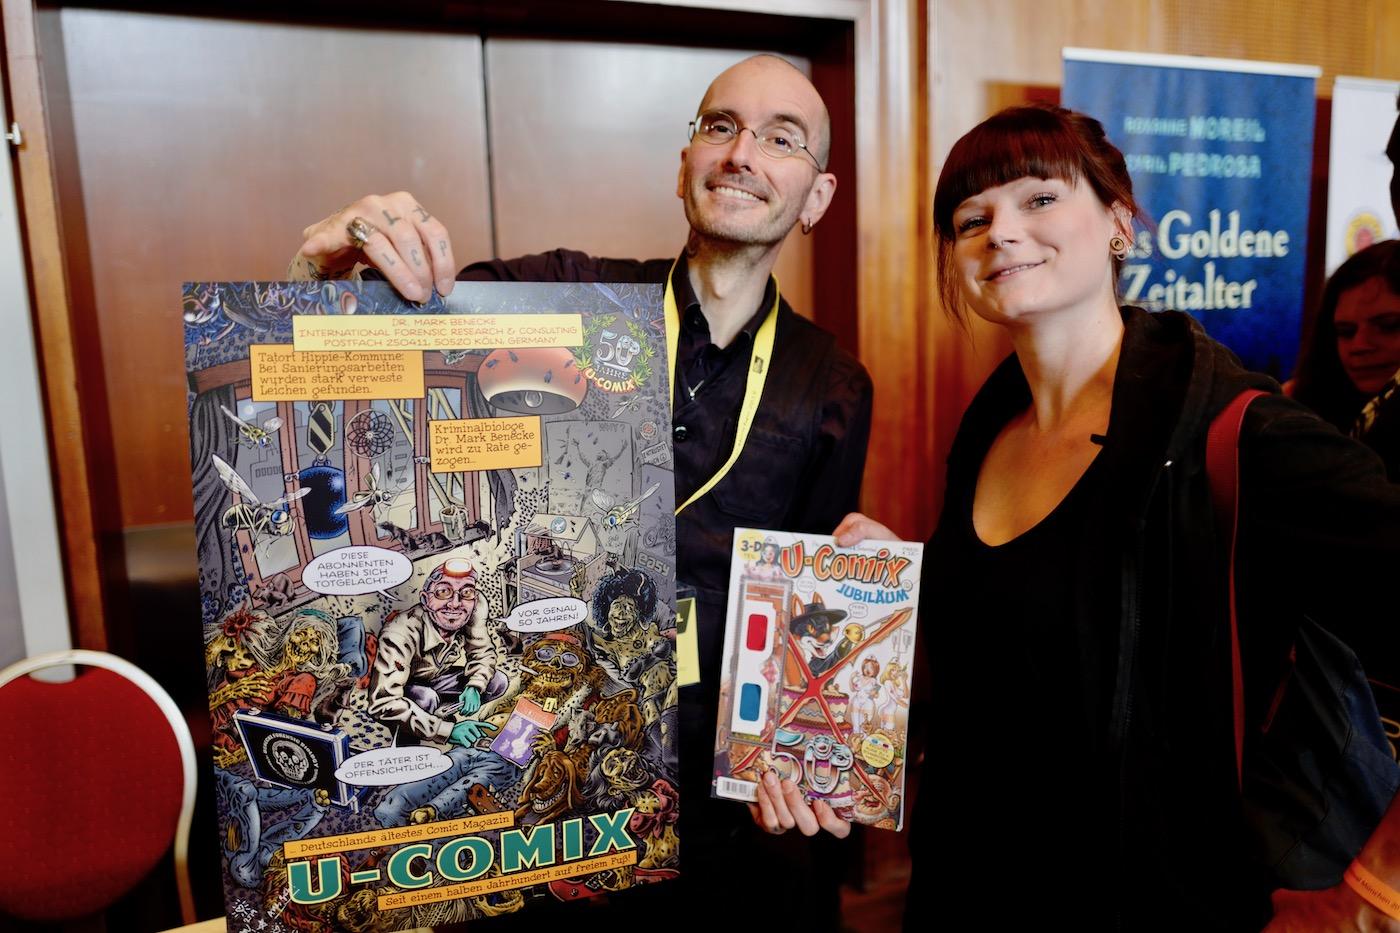 mark_benecke_comic_festival_muenchen_munich_comic_con_2019 - 60.jpg